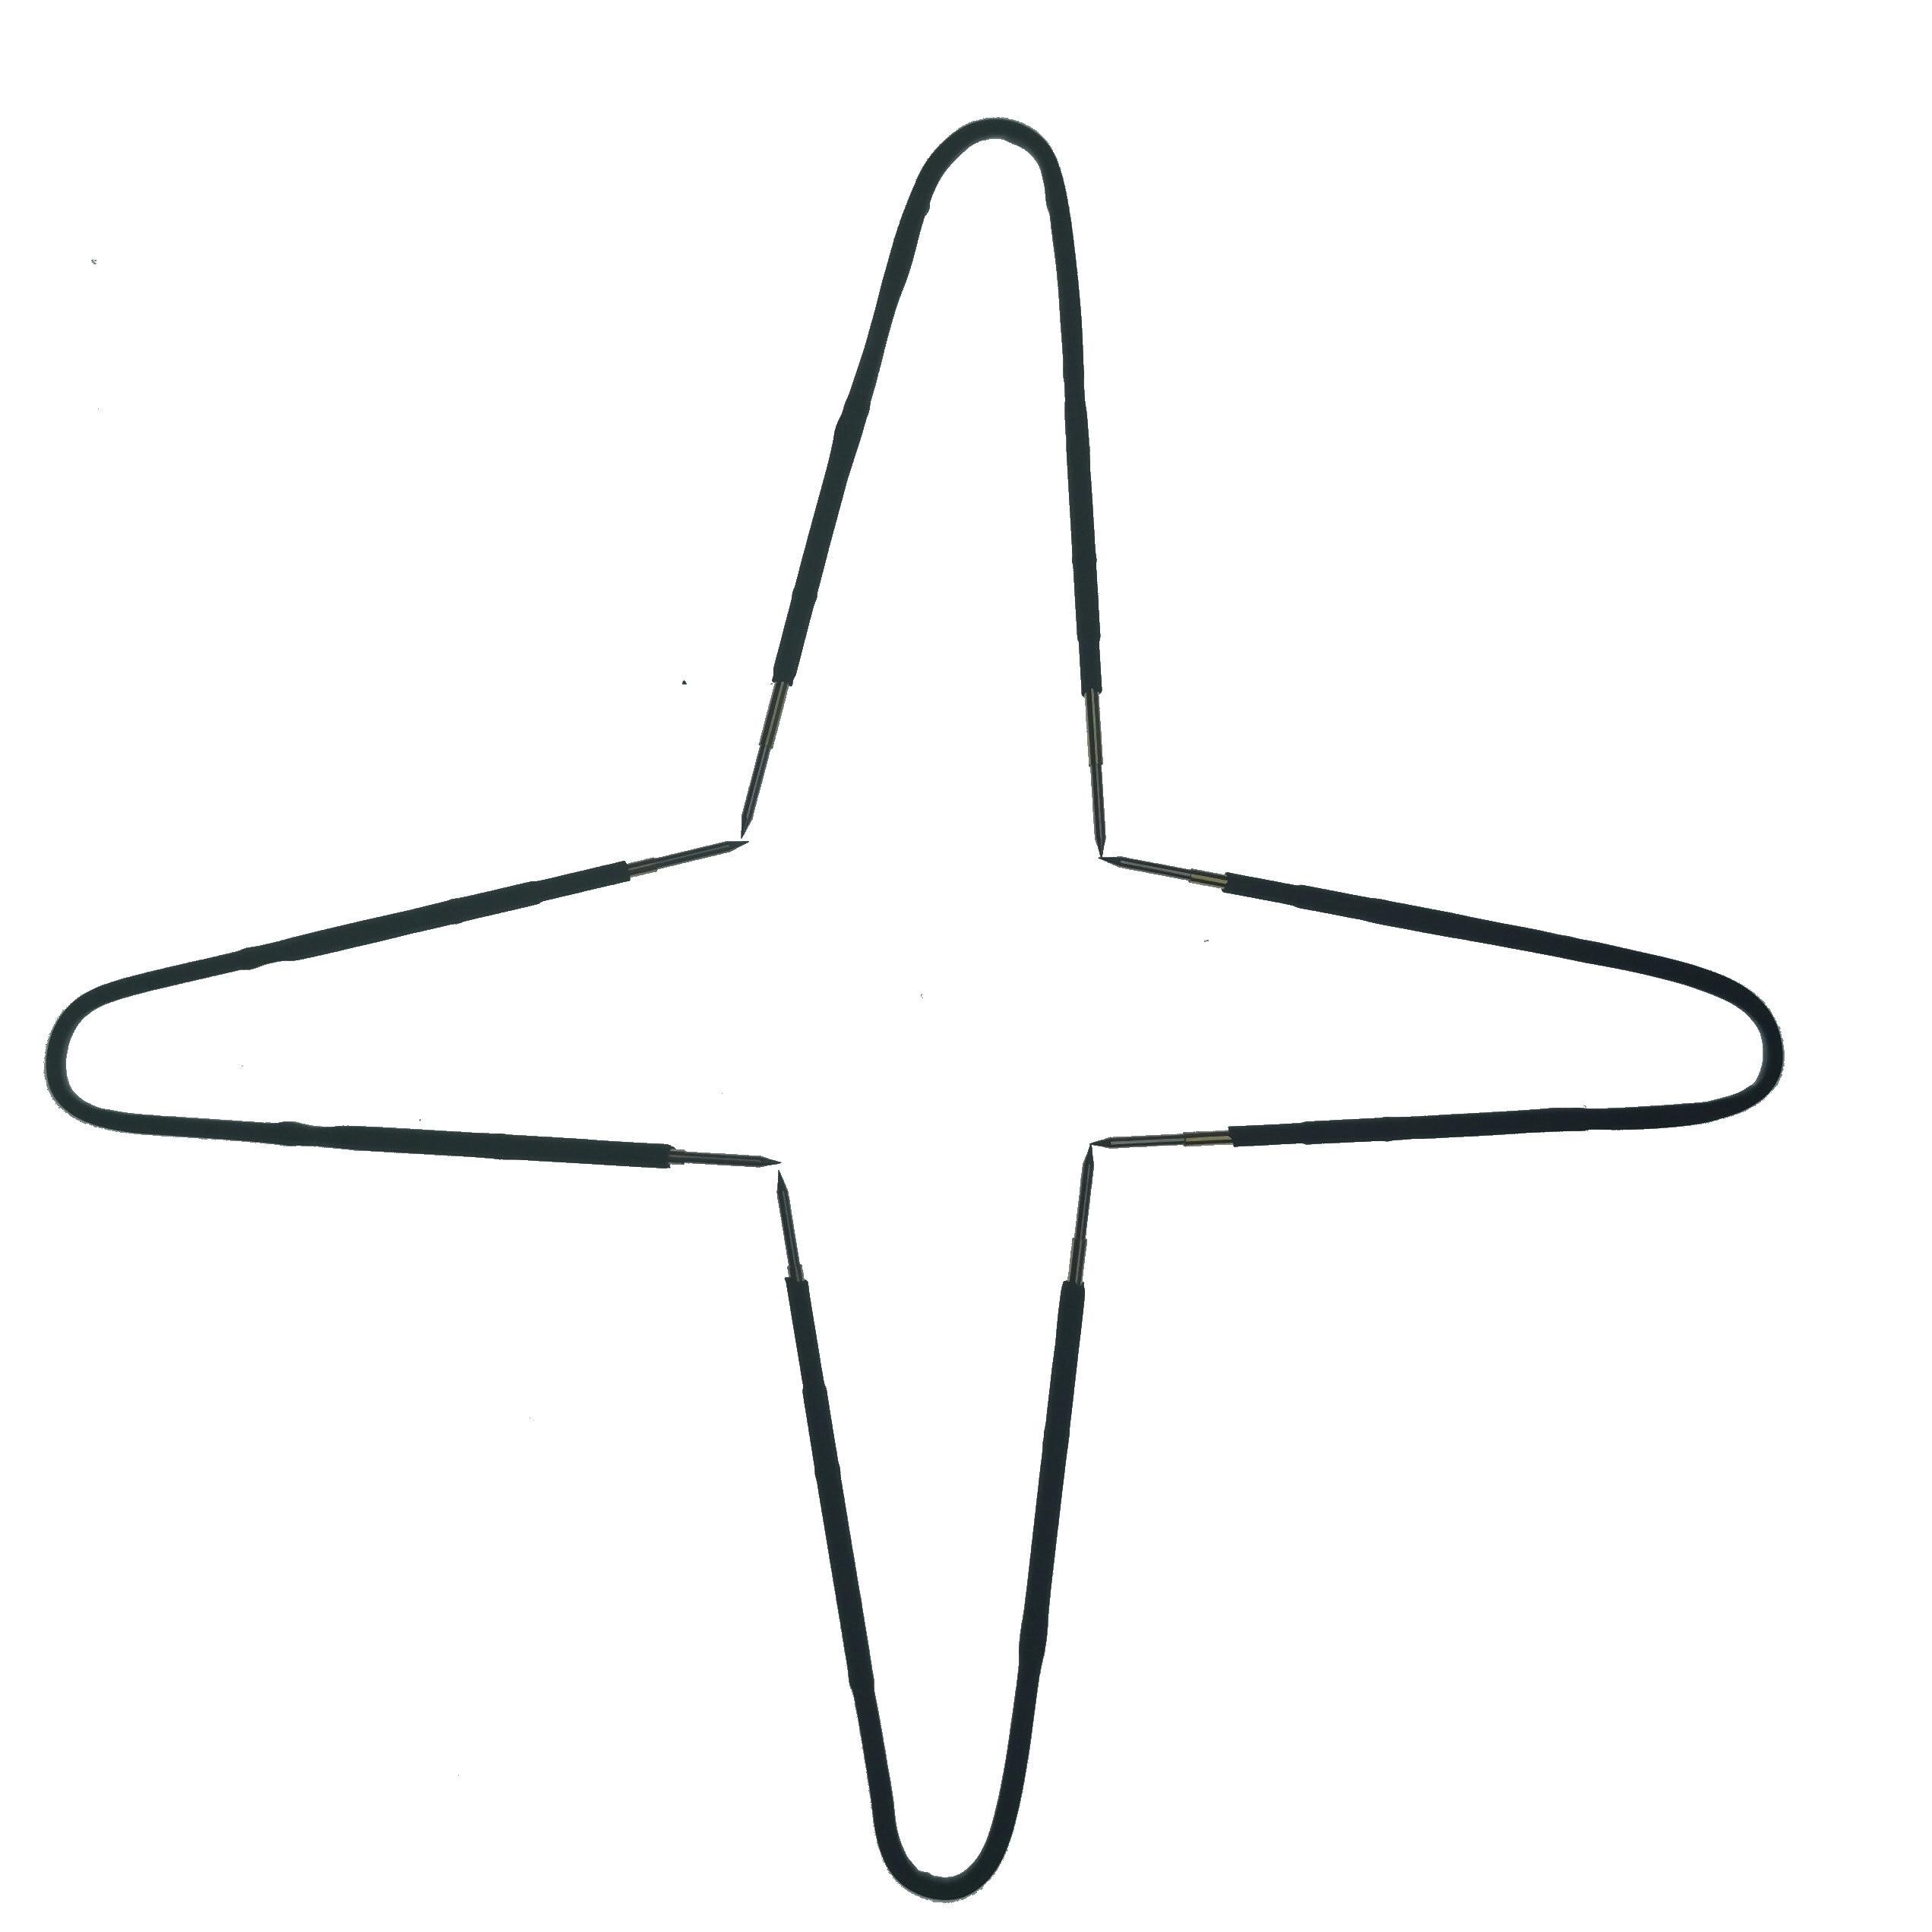 Daten Recovery Festplatte Kurzschluss Sonde Mrt Pc3000 Festplatte Kurzschluss Bord Test Kurzschluss Sonde